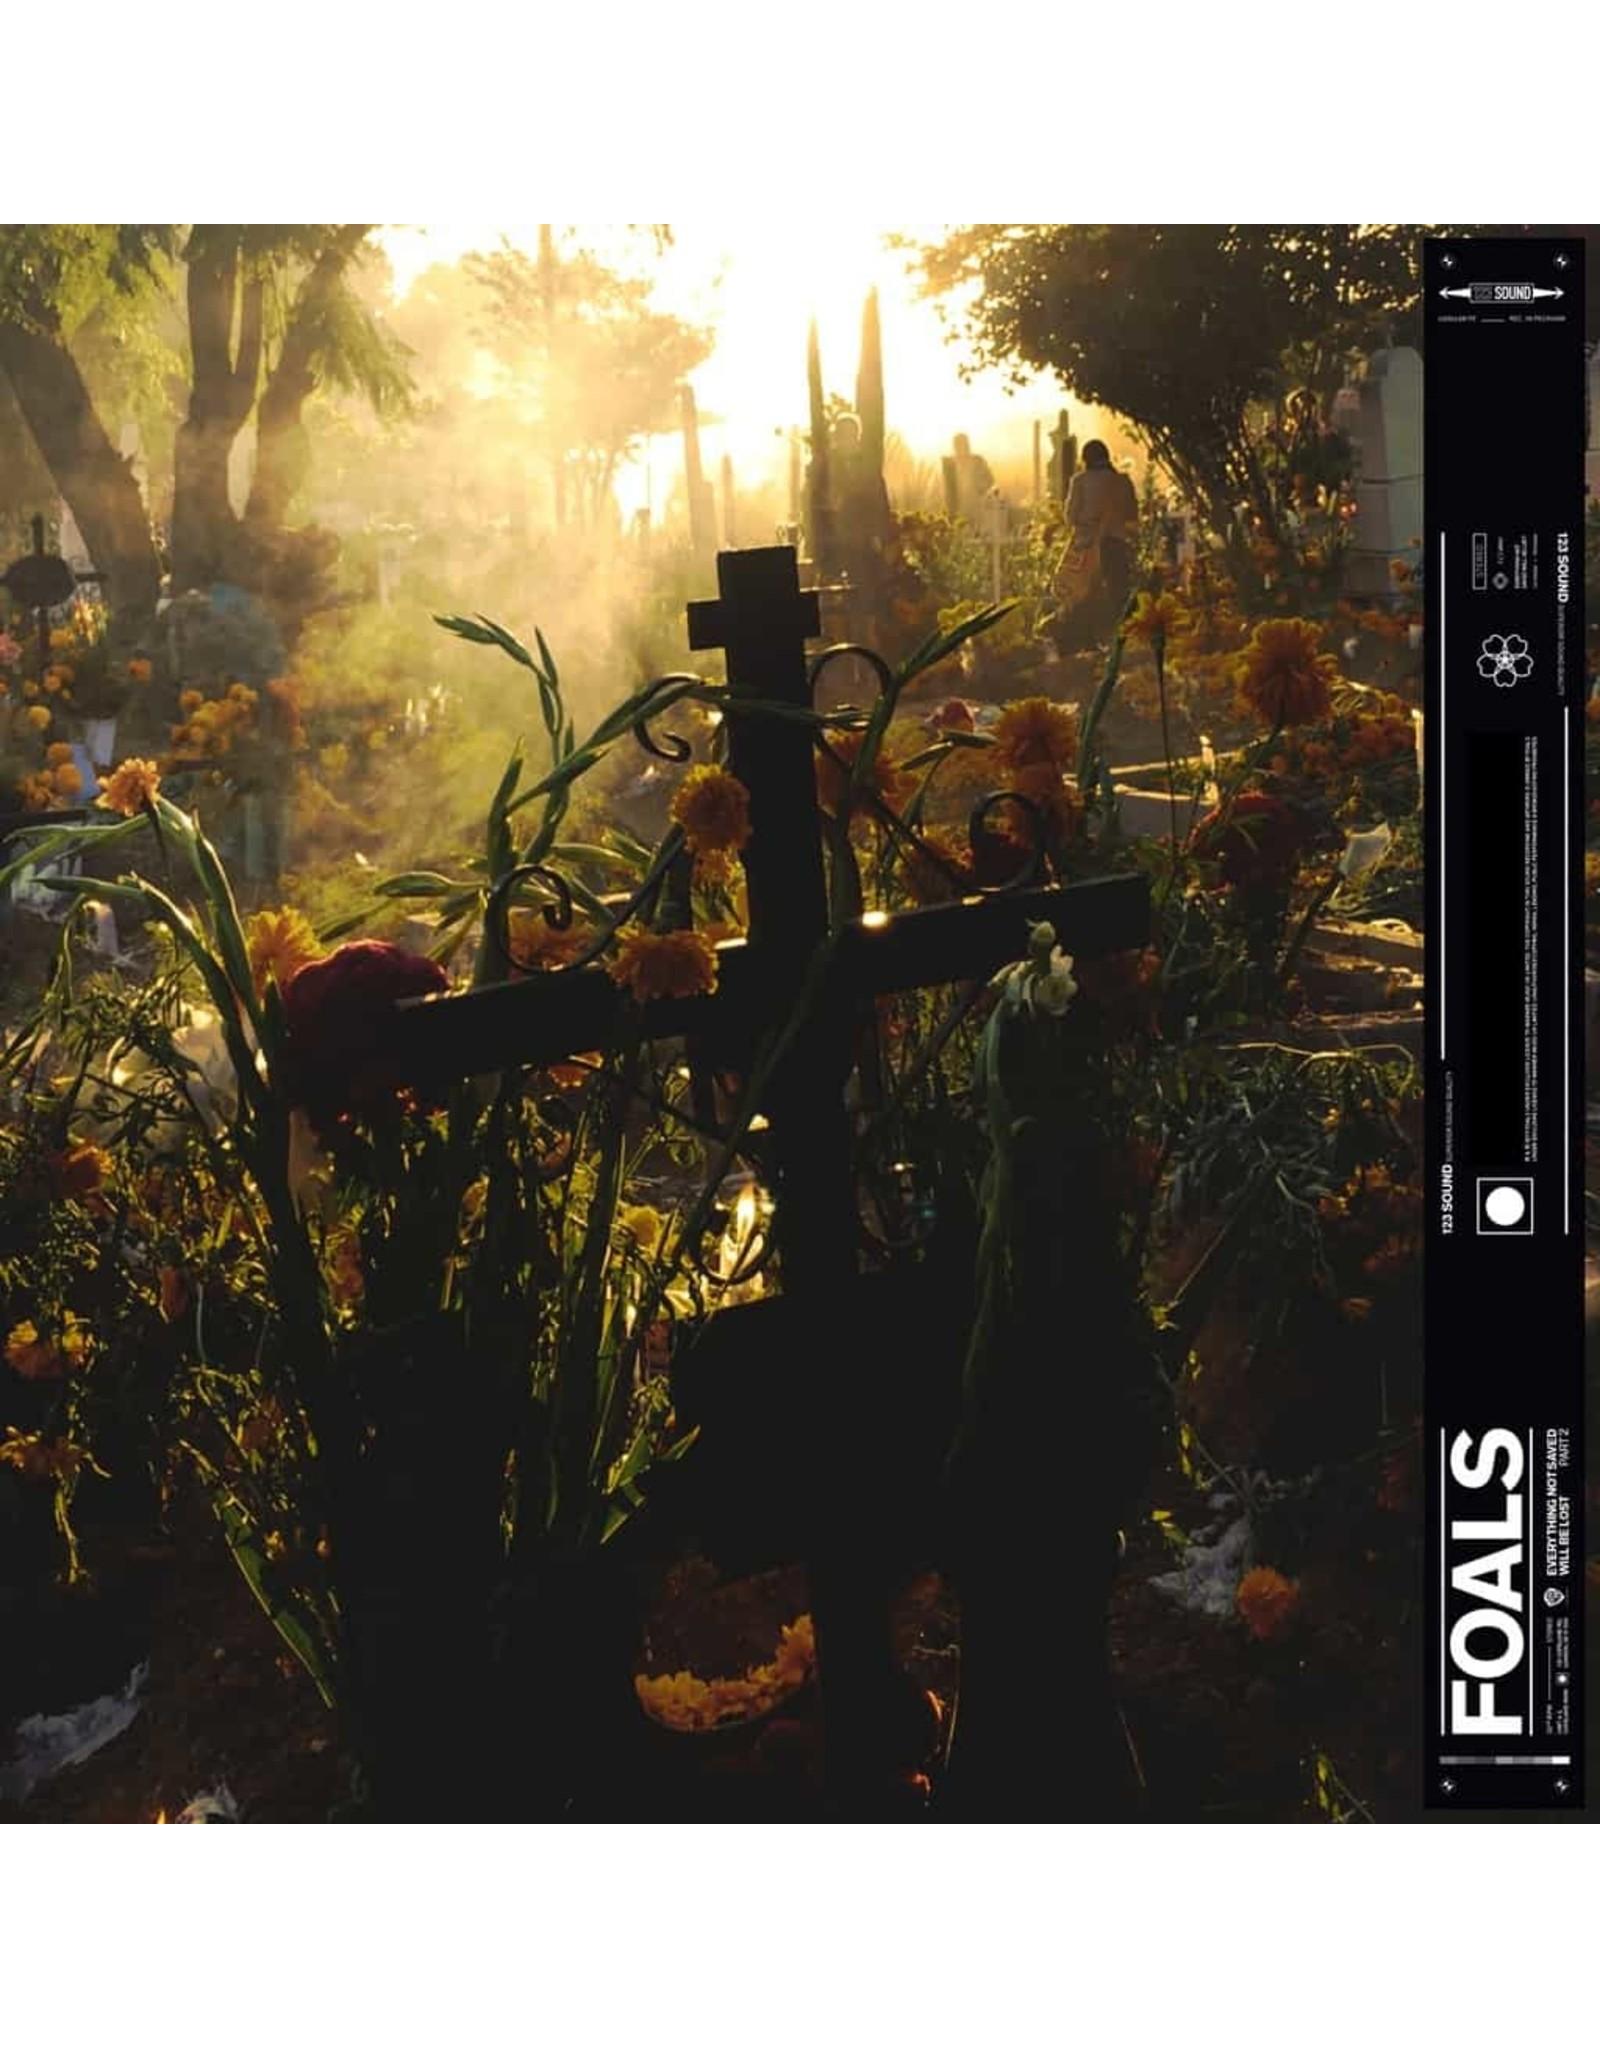 Foals - Everything Is Not Lost Part 2 (Exclusive Orange Vinyl)